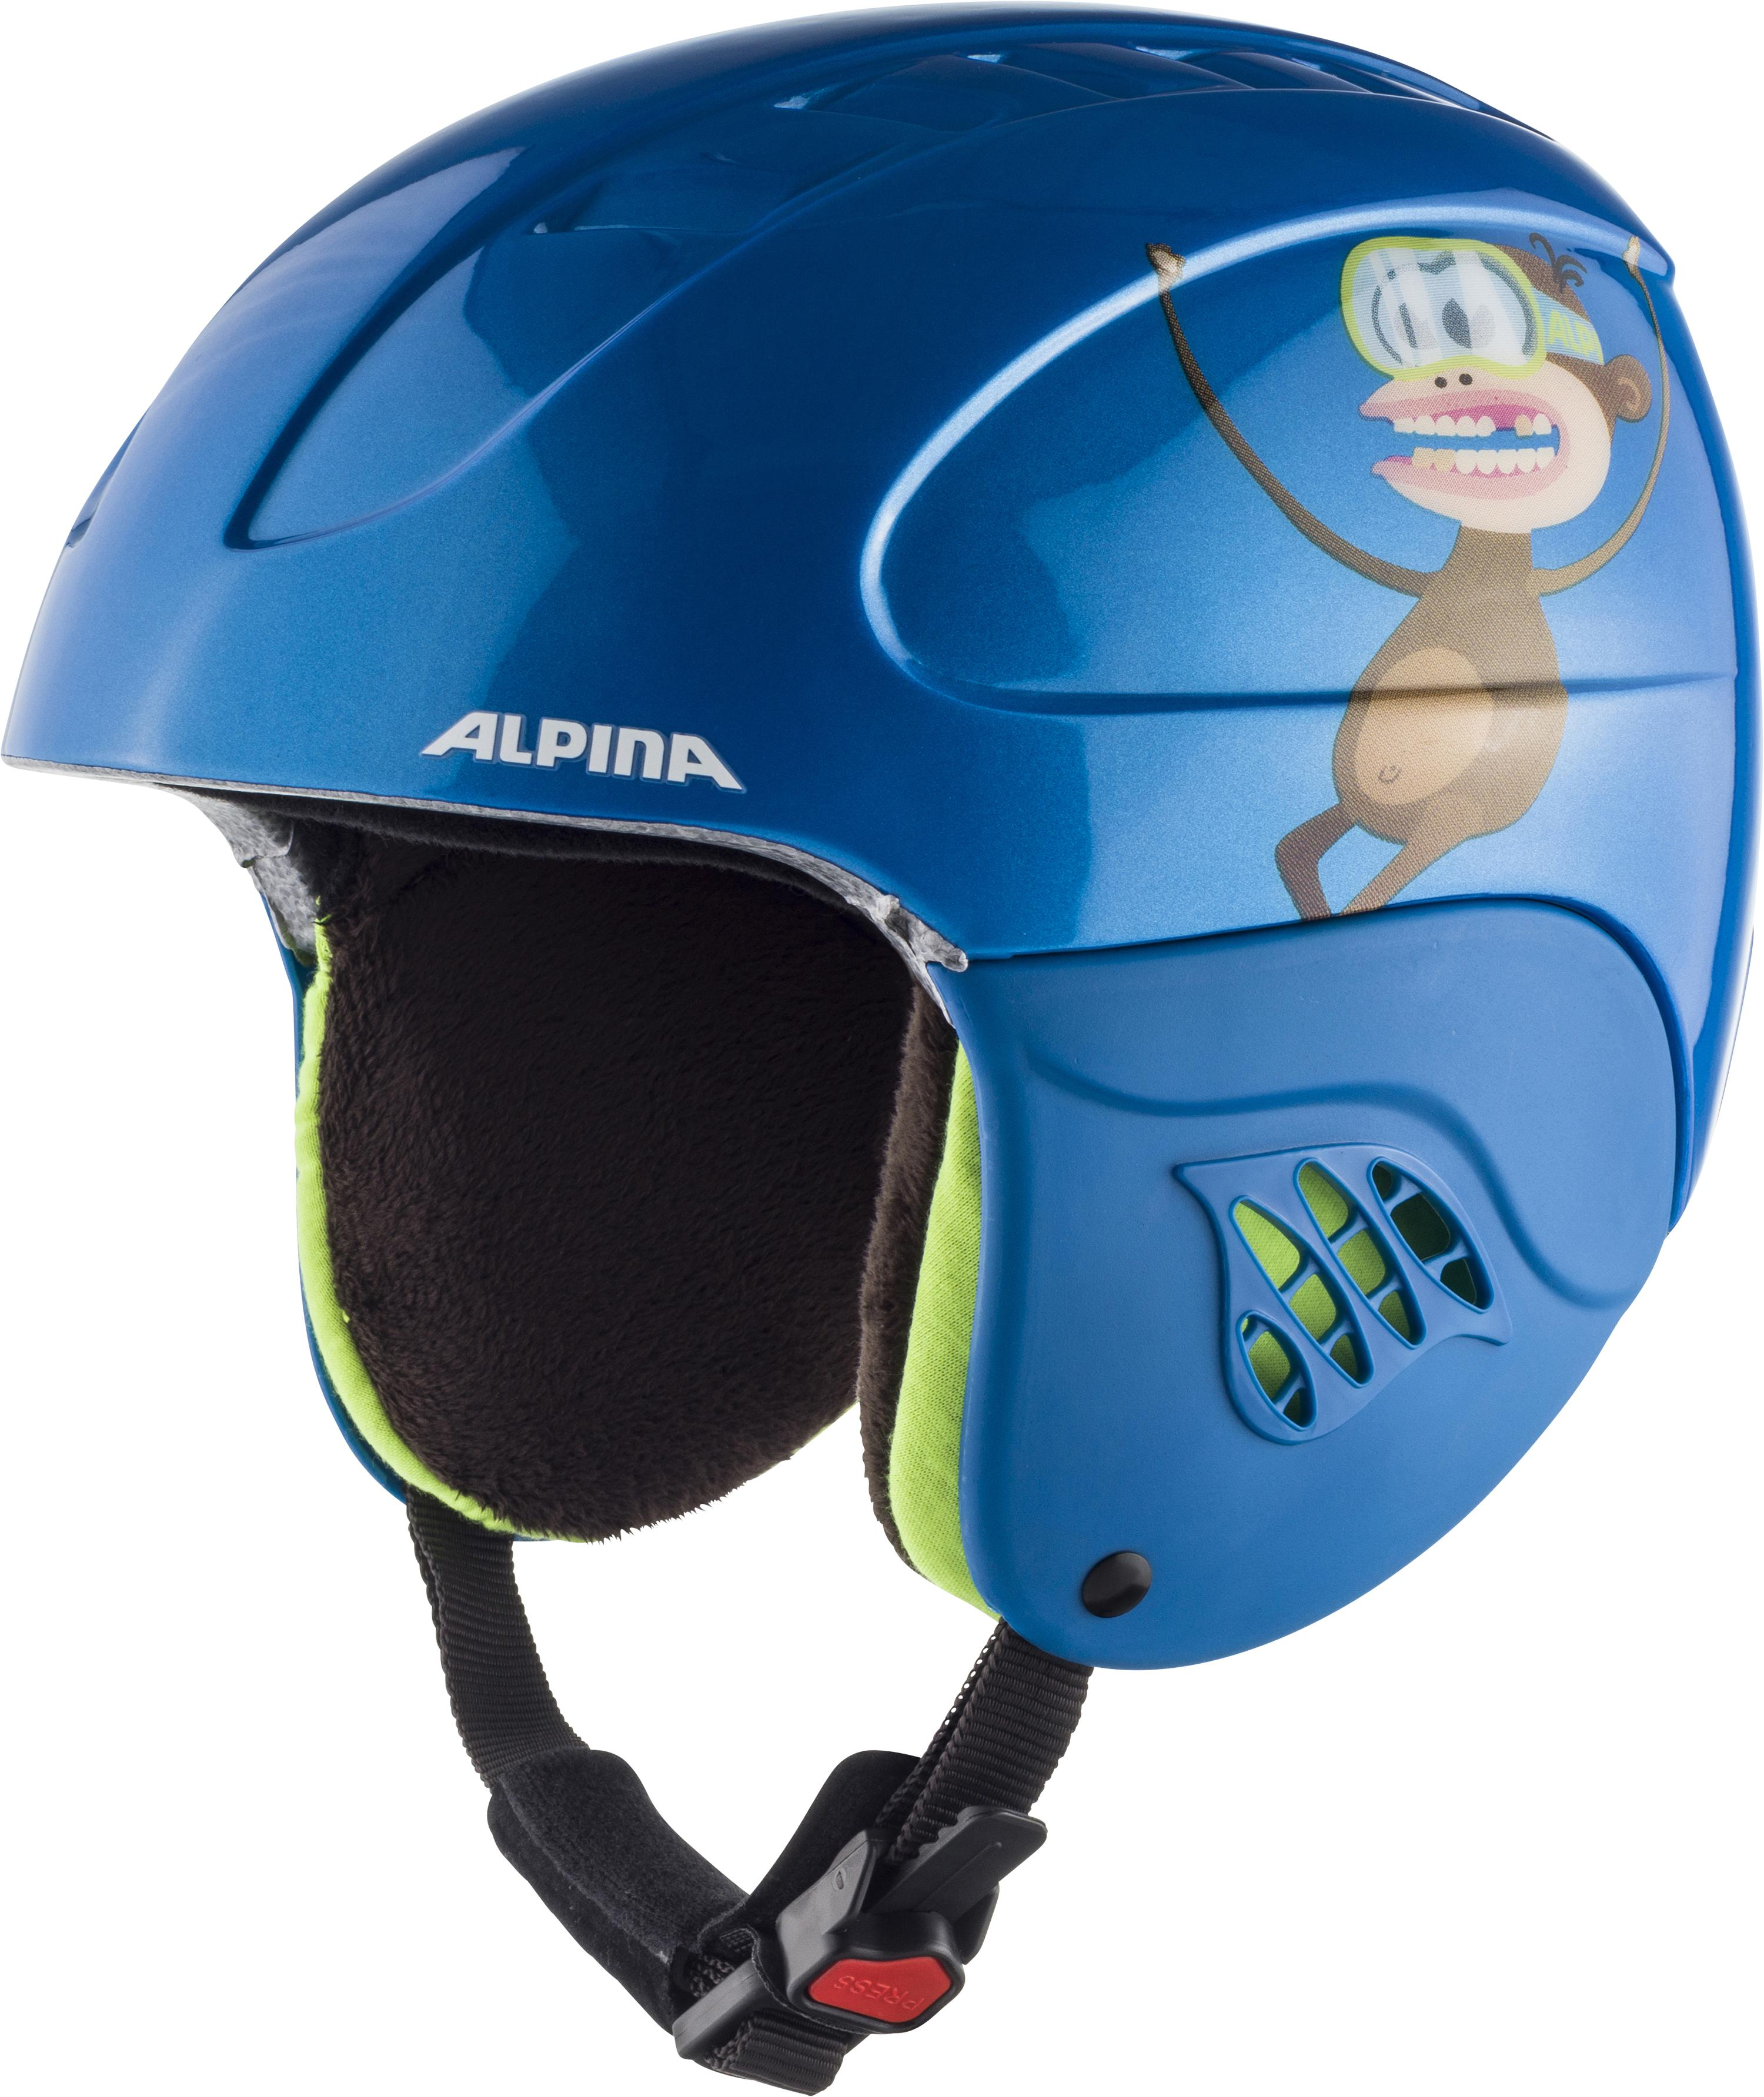 Alpina Carat Kinder Skihelm (Größe 54 58 cm, 49 blue monkey)